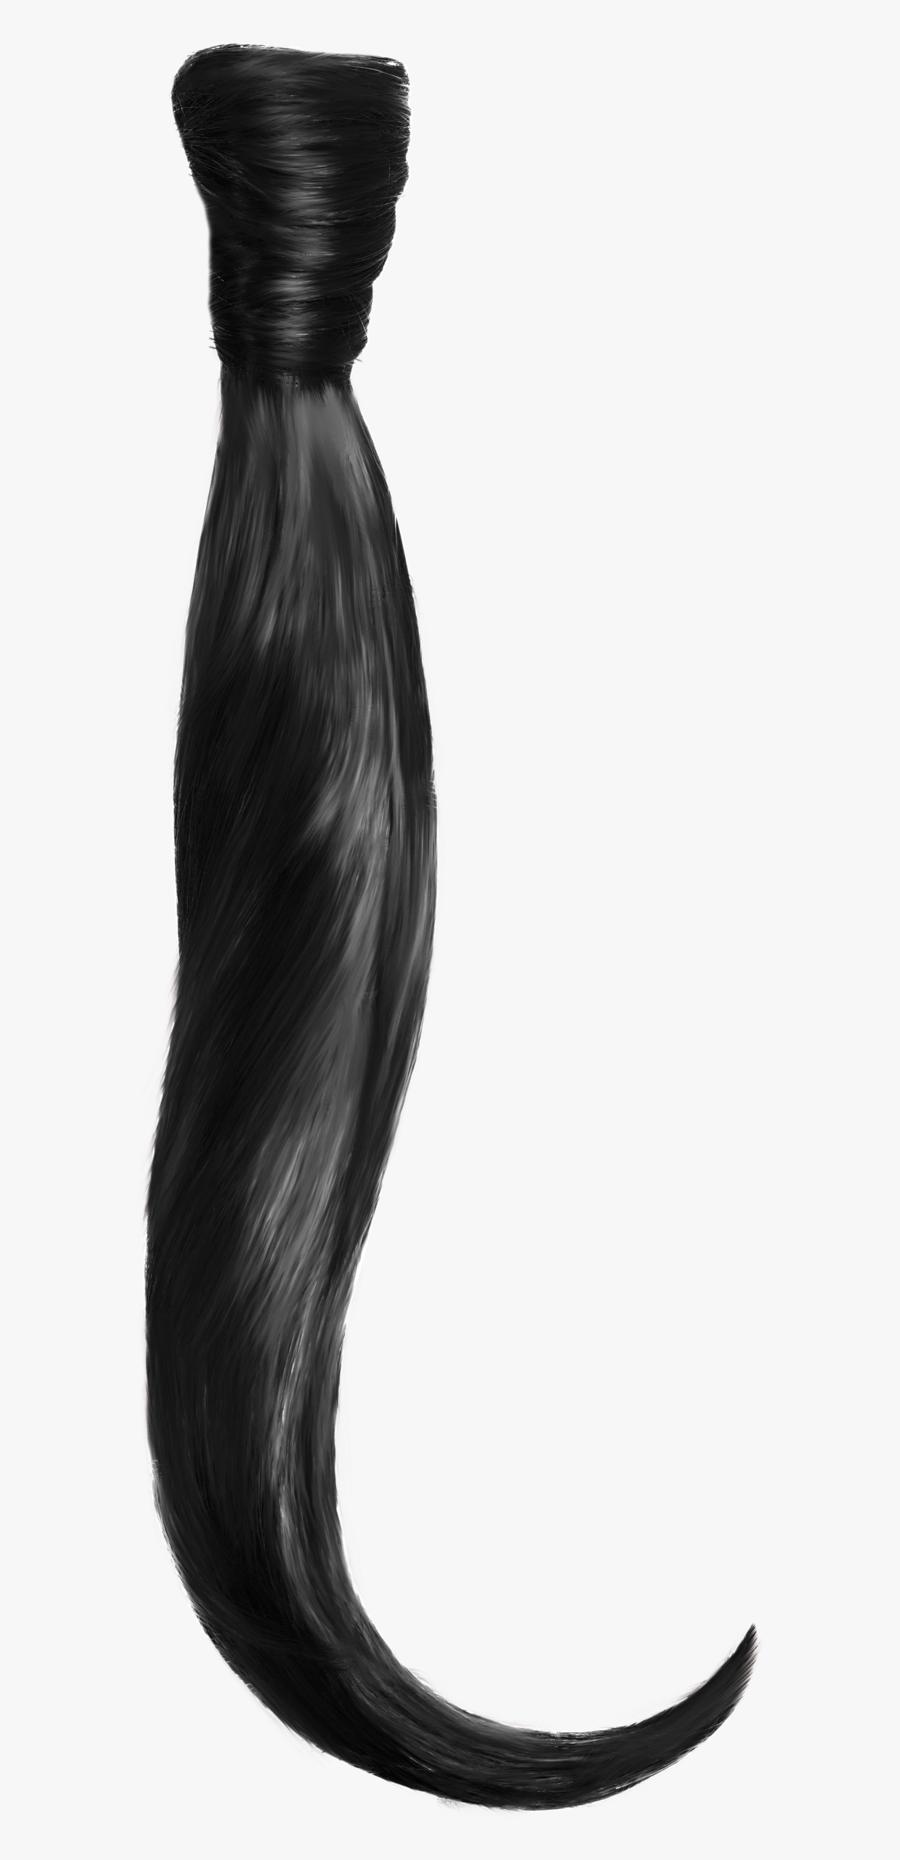 Long Hair Png - Lace Wig, Transparent Clipart